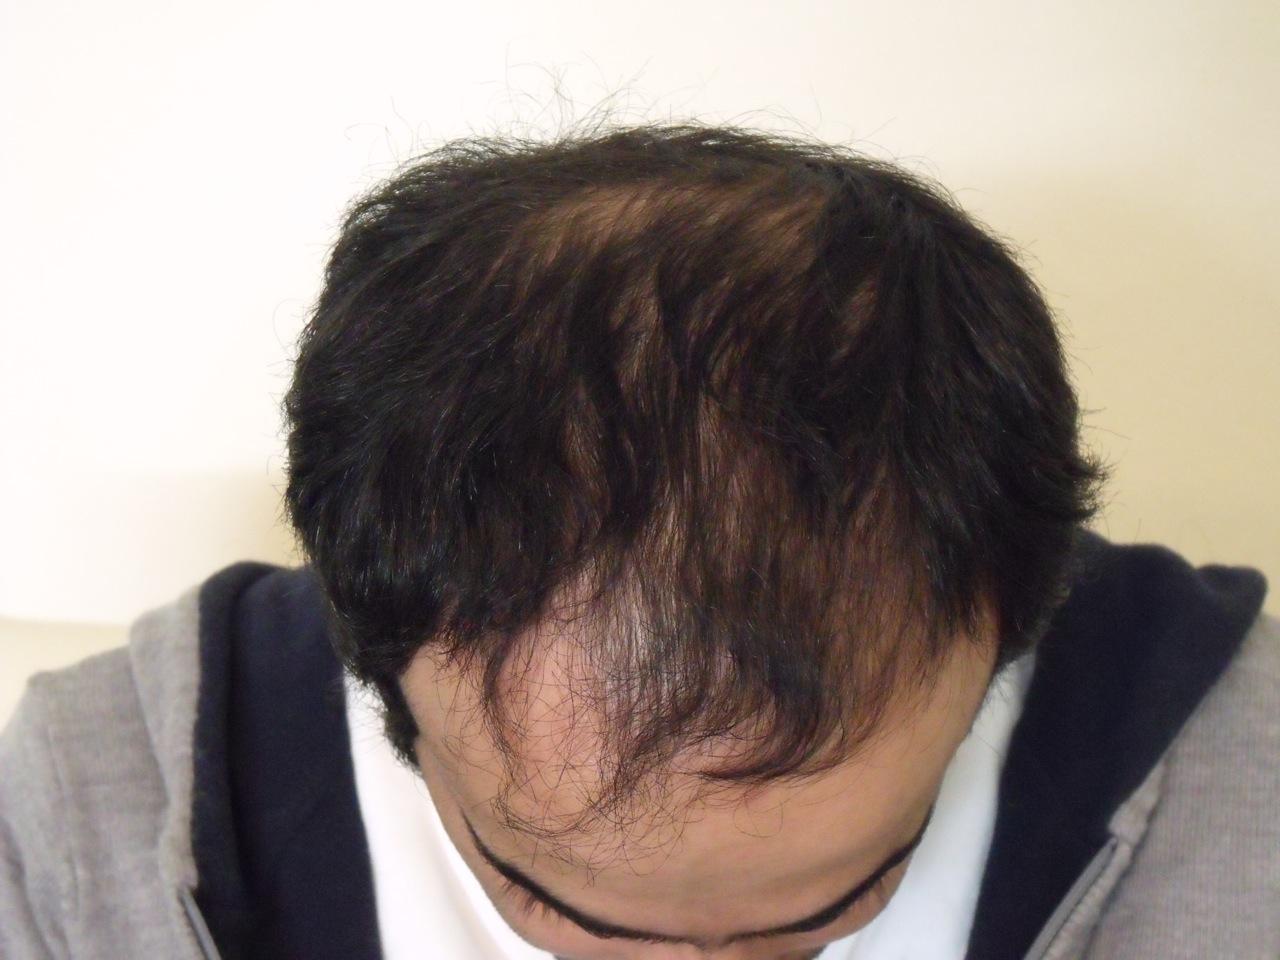 Hair Transplant Help